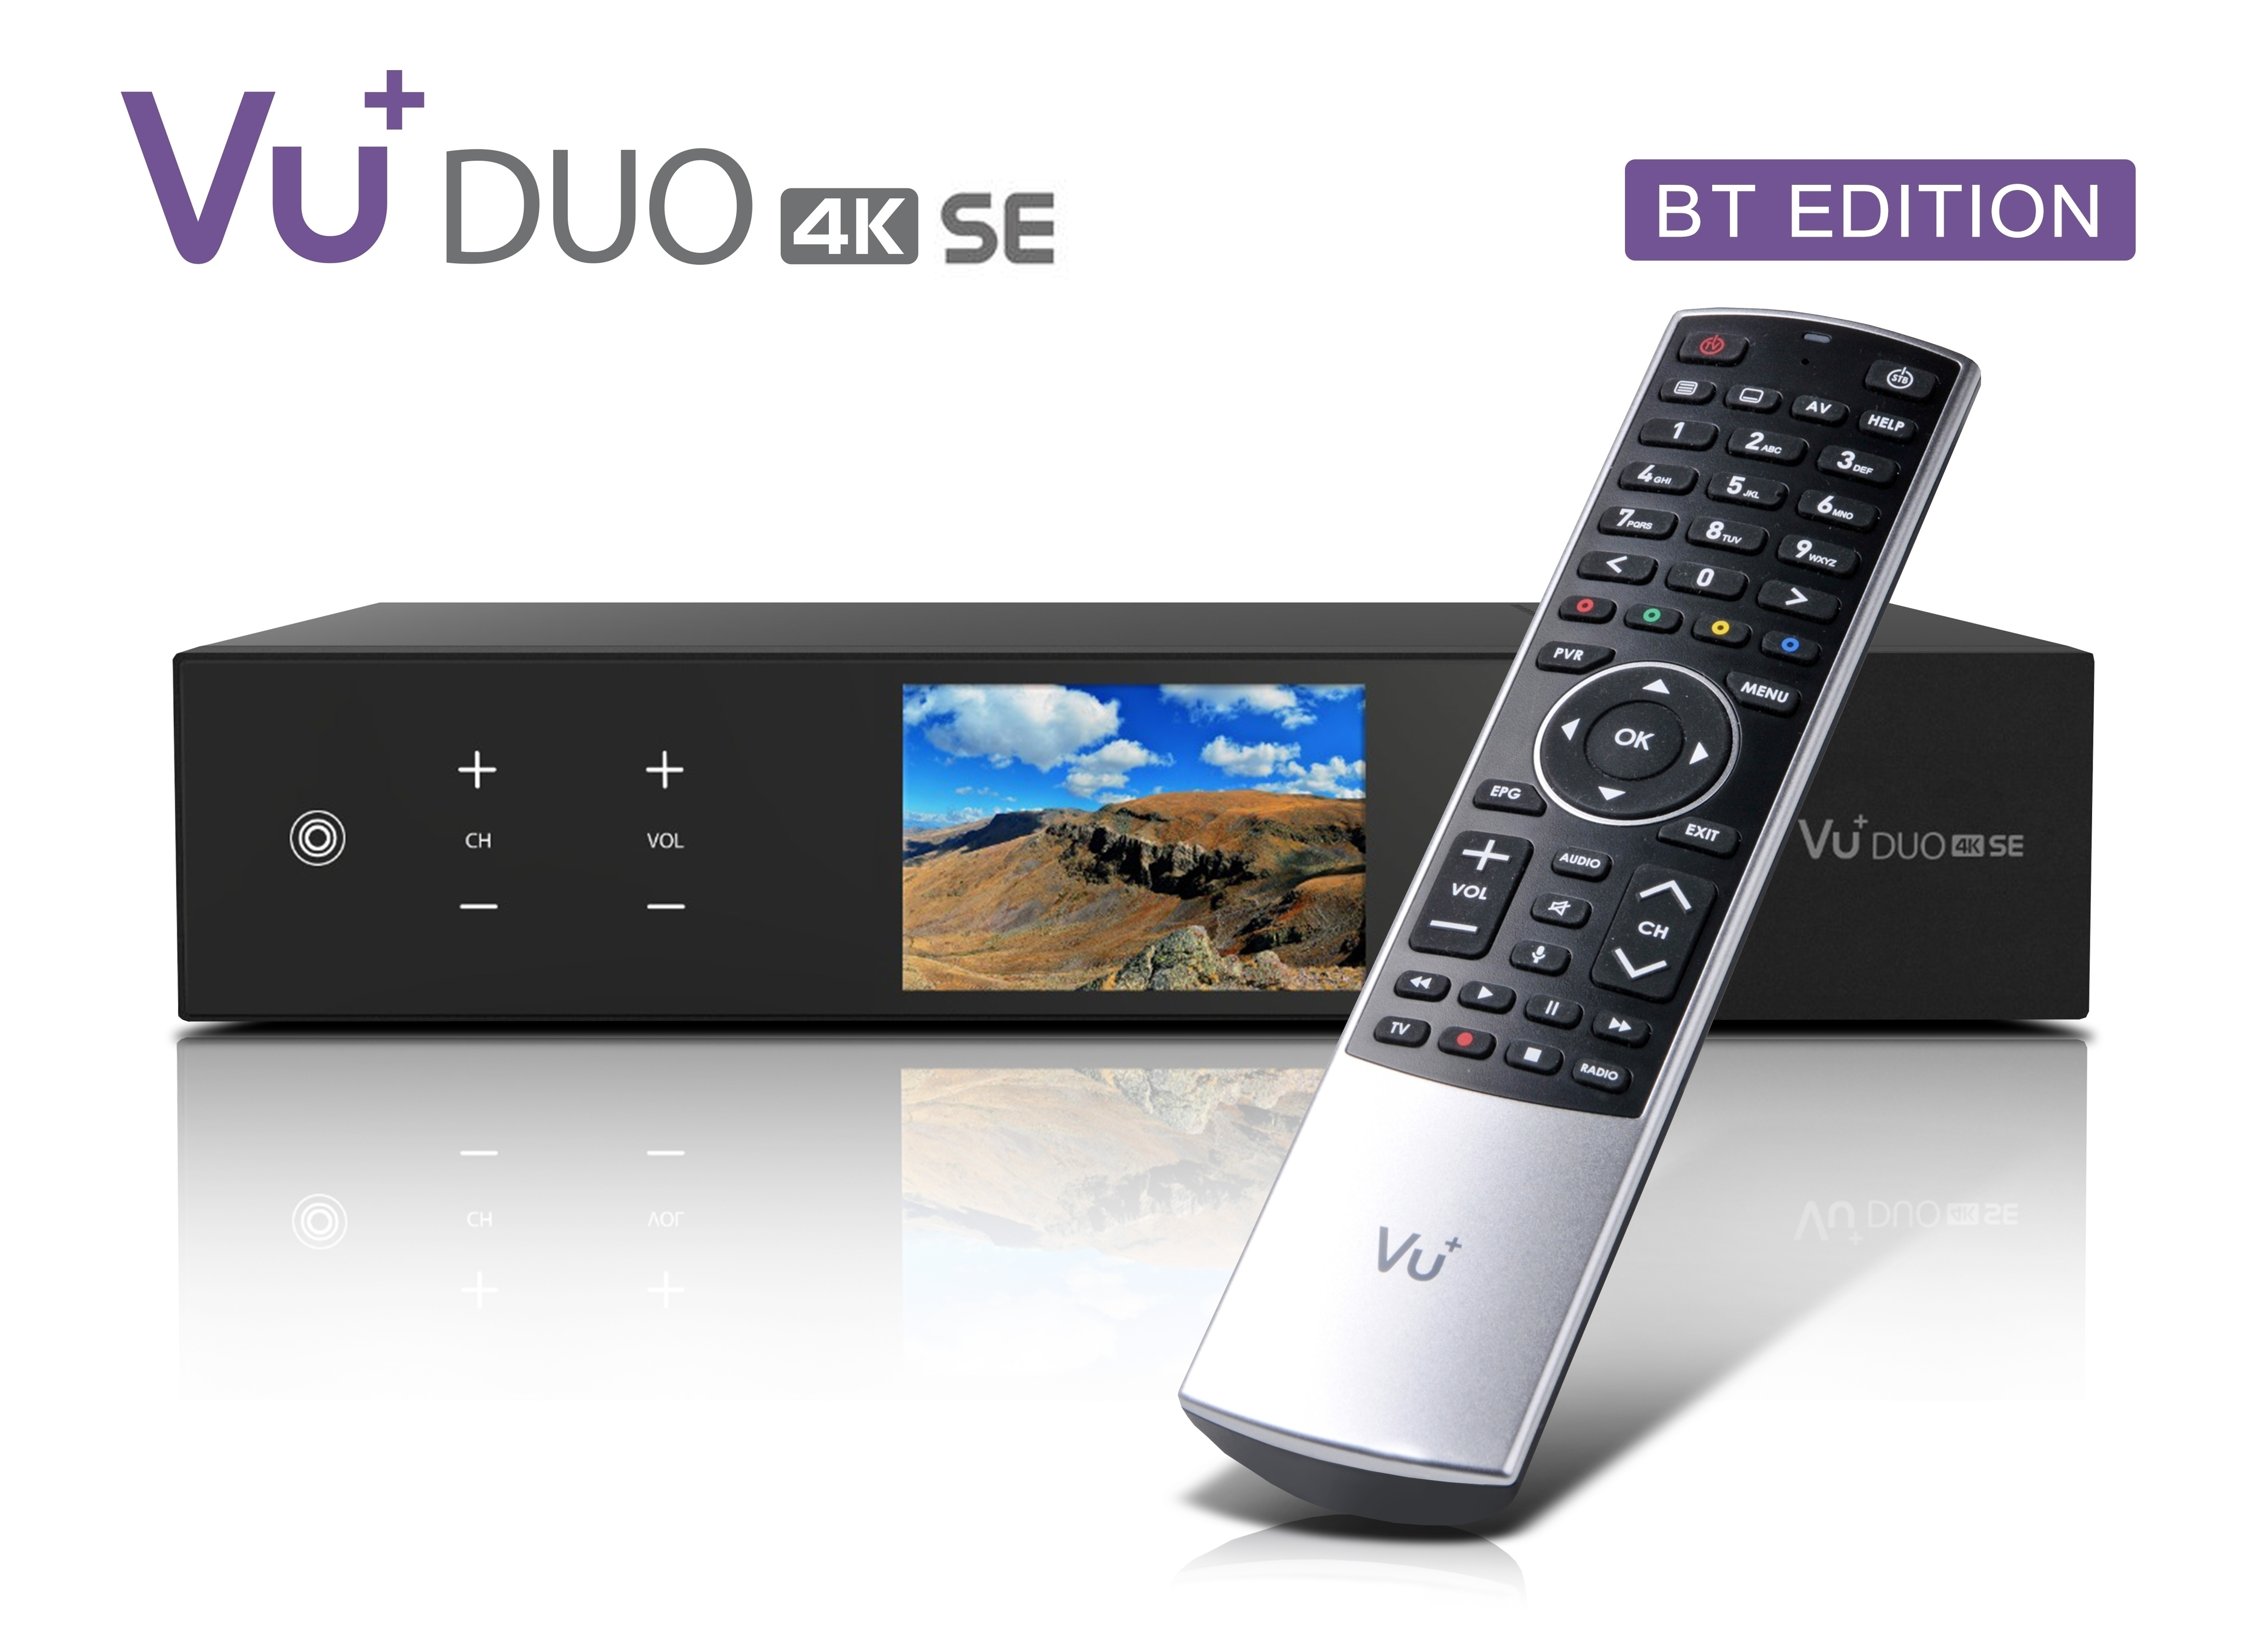 VU+ Duo 4K SE BT 1x DVB-C FBC Tuner PVR Linux Receiver UHD 2160p